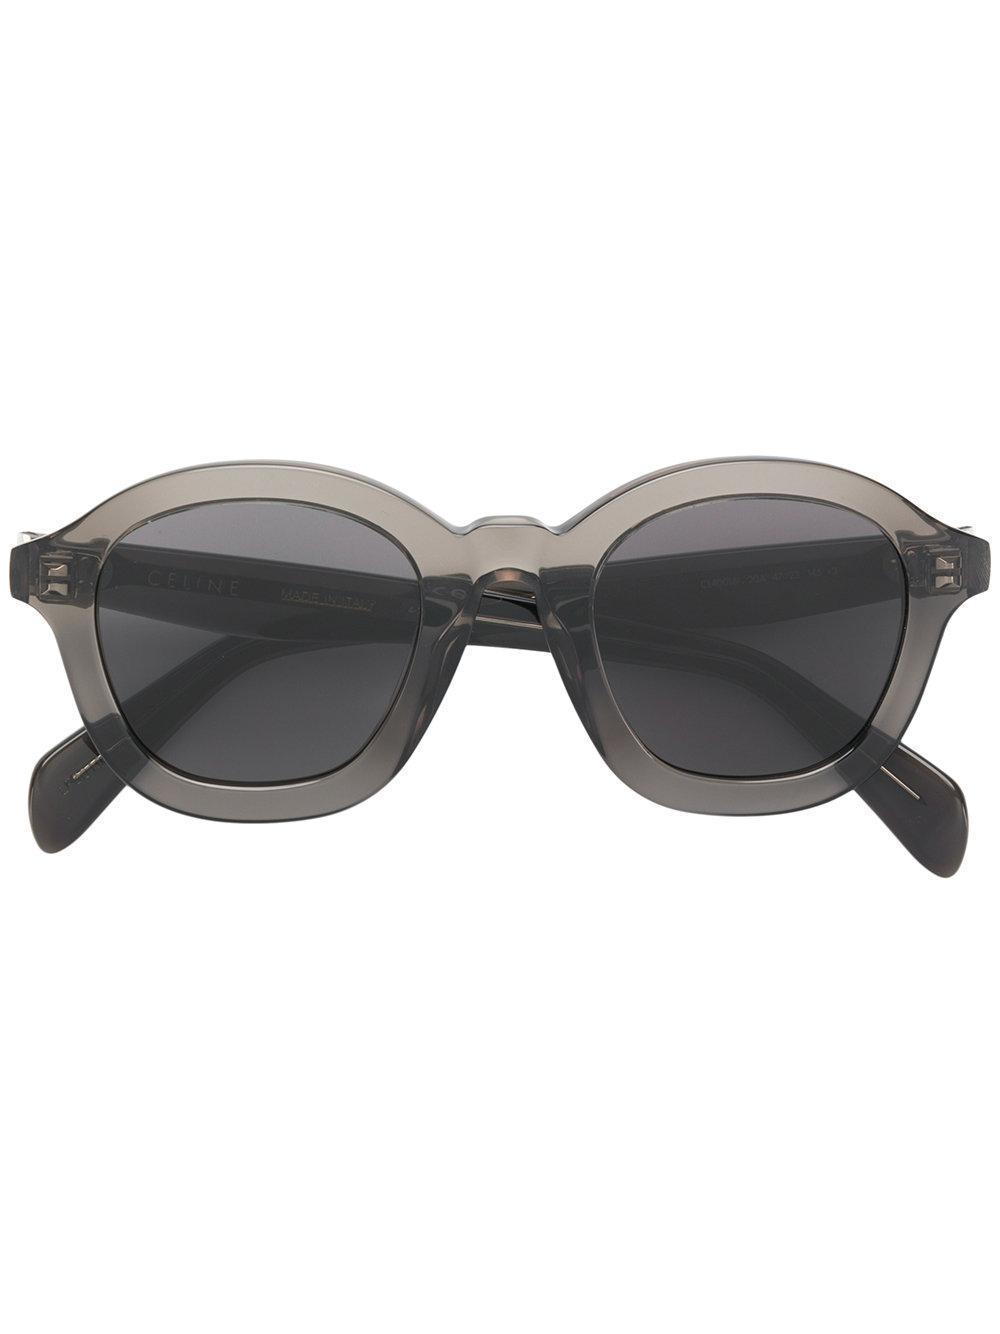 Celine Round Frame Sunglasses In Grey